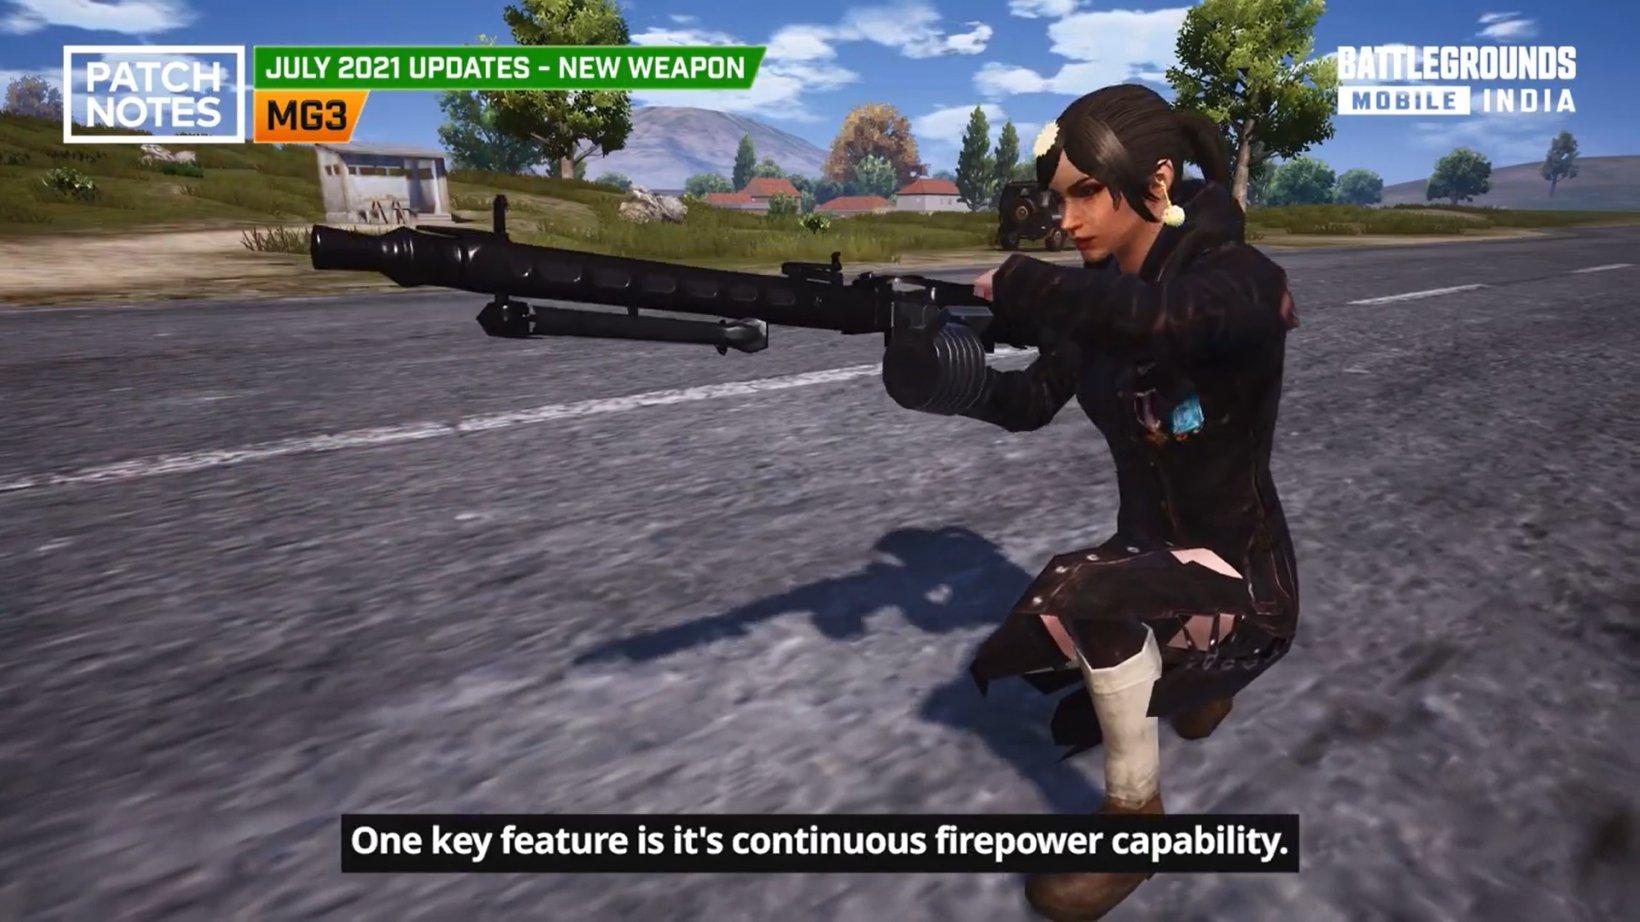 battlegrounds mobile india new gun mg3